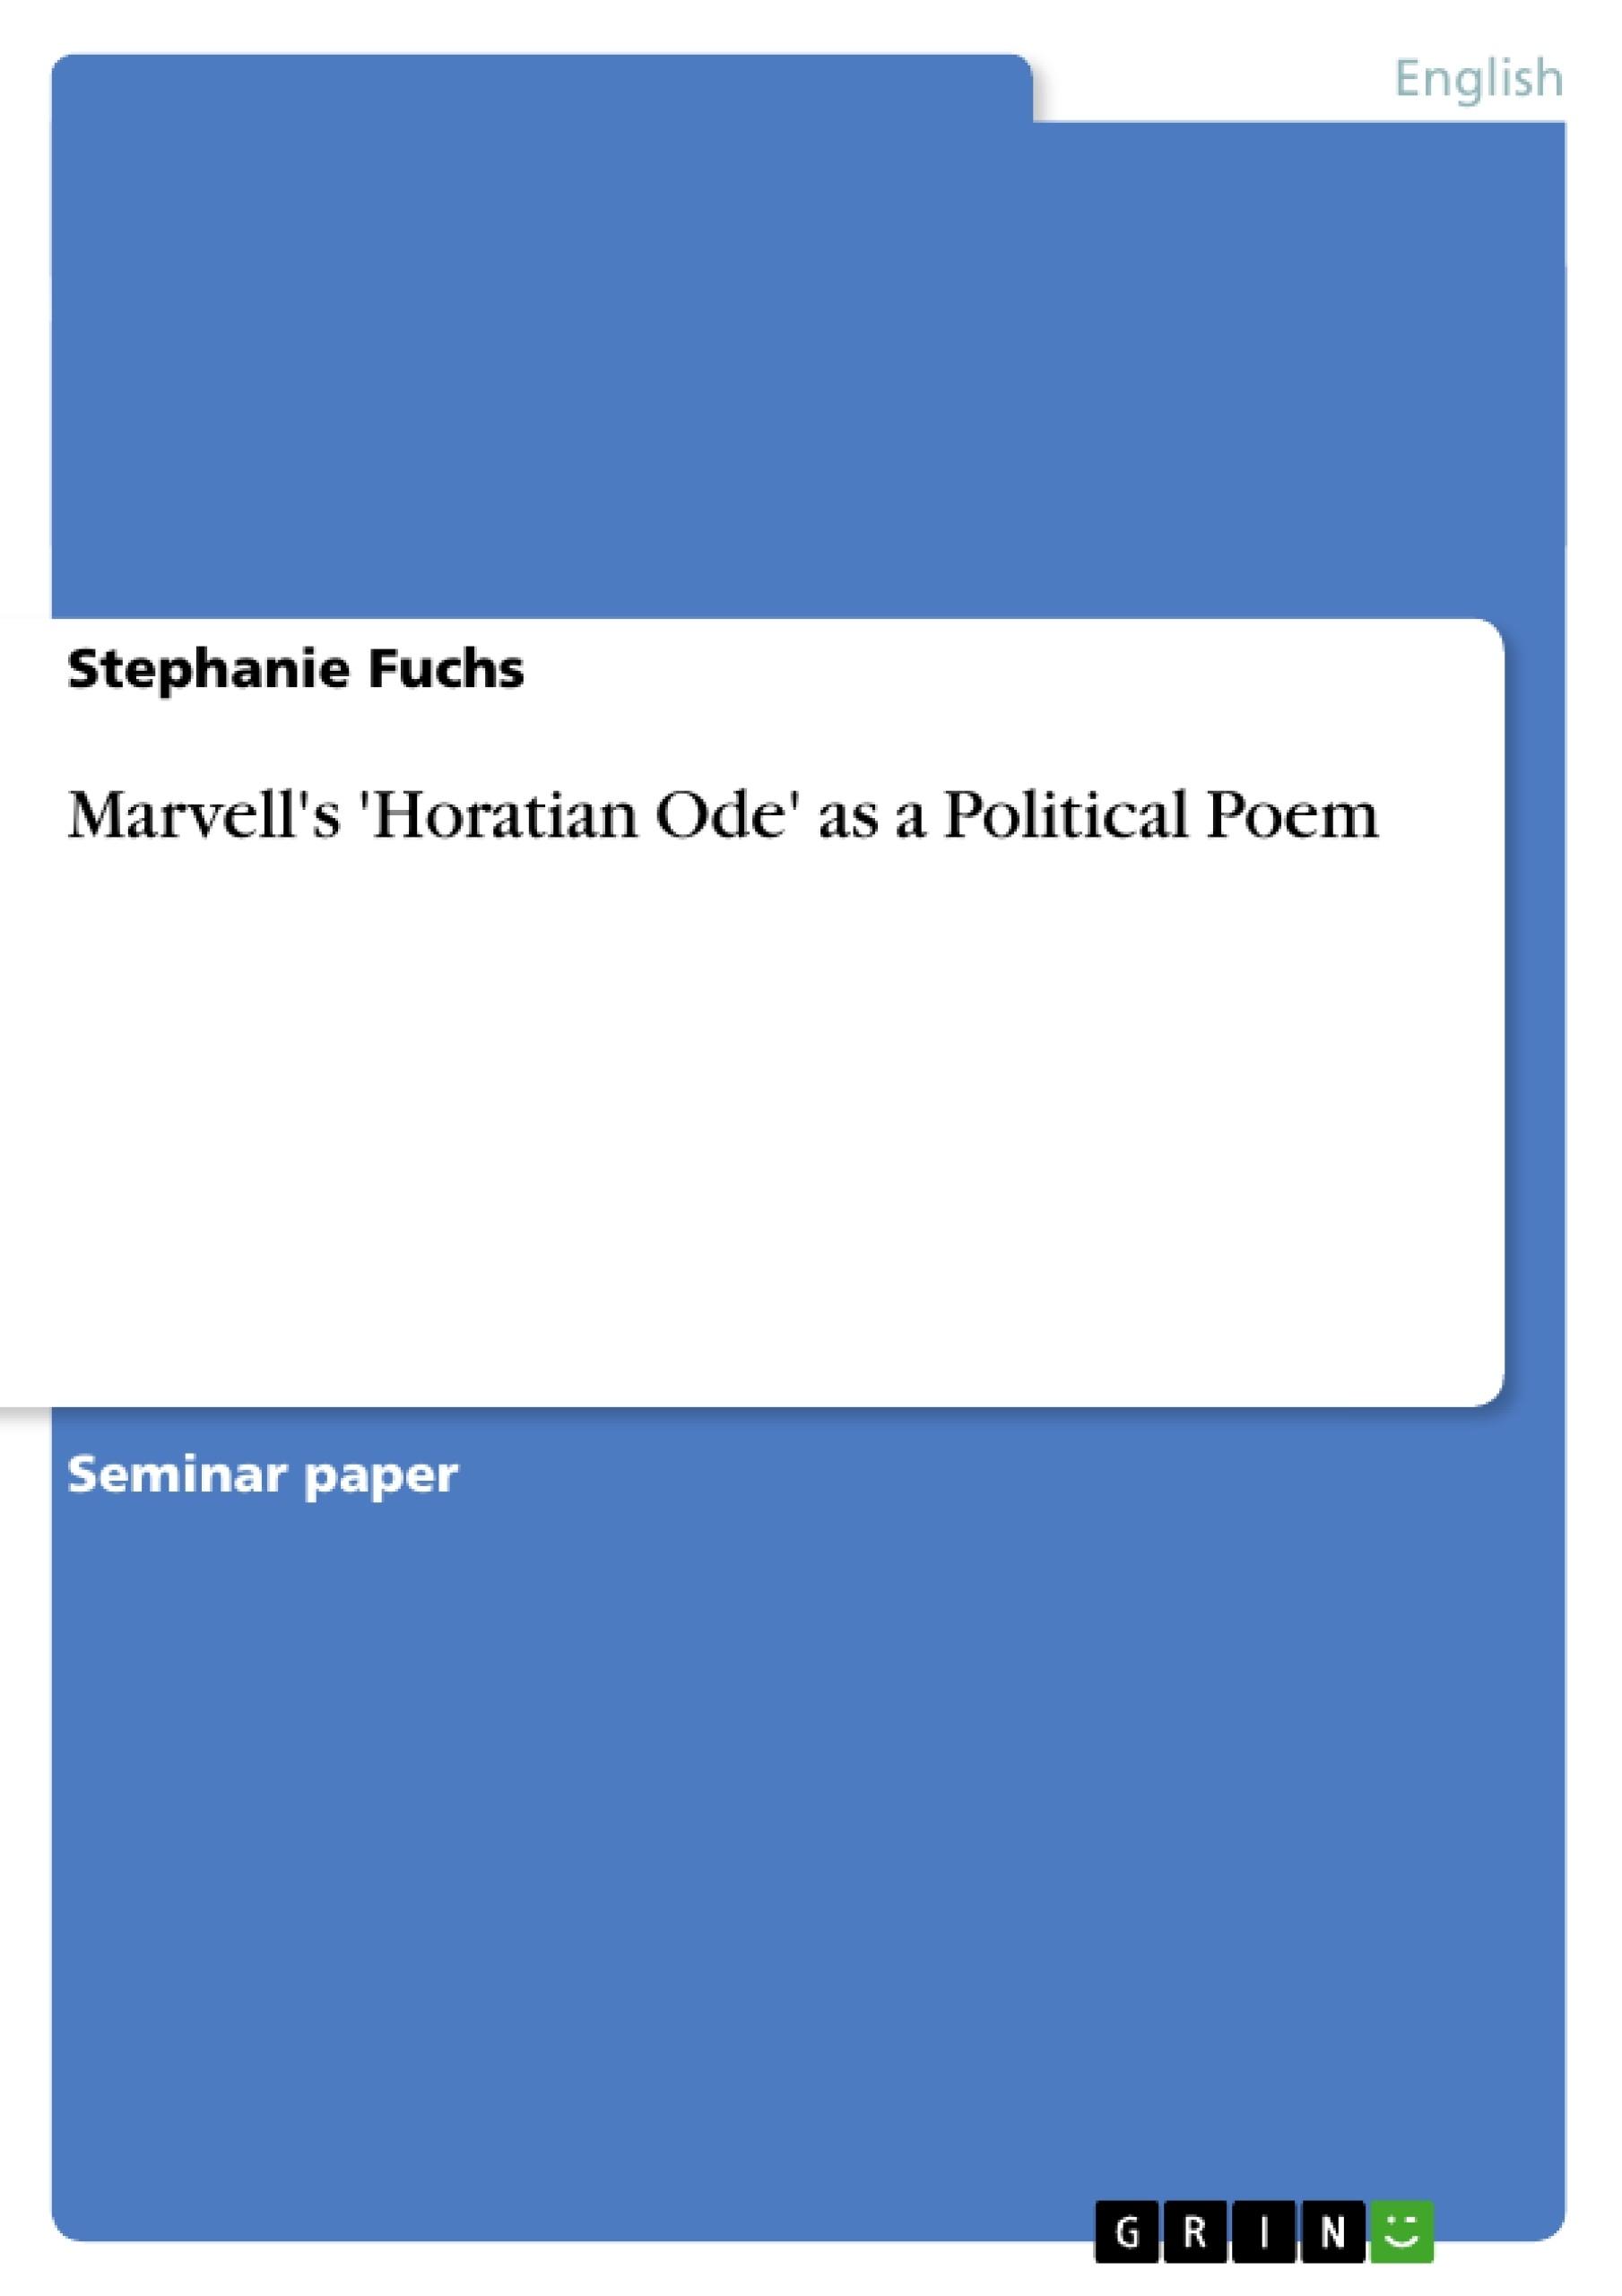 GRIN - Marvell's 'Horatian Ode' as a Political Poem